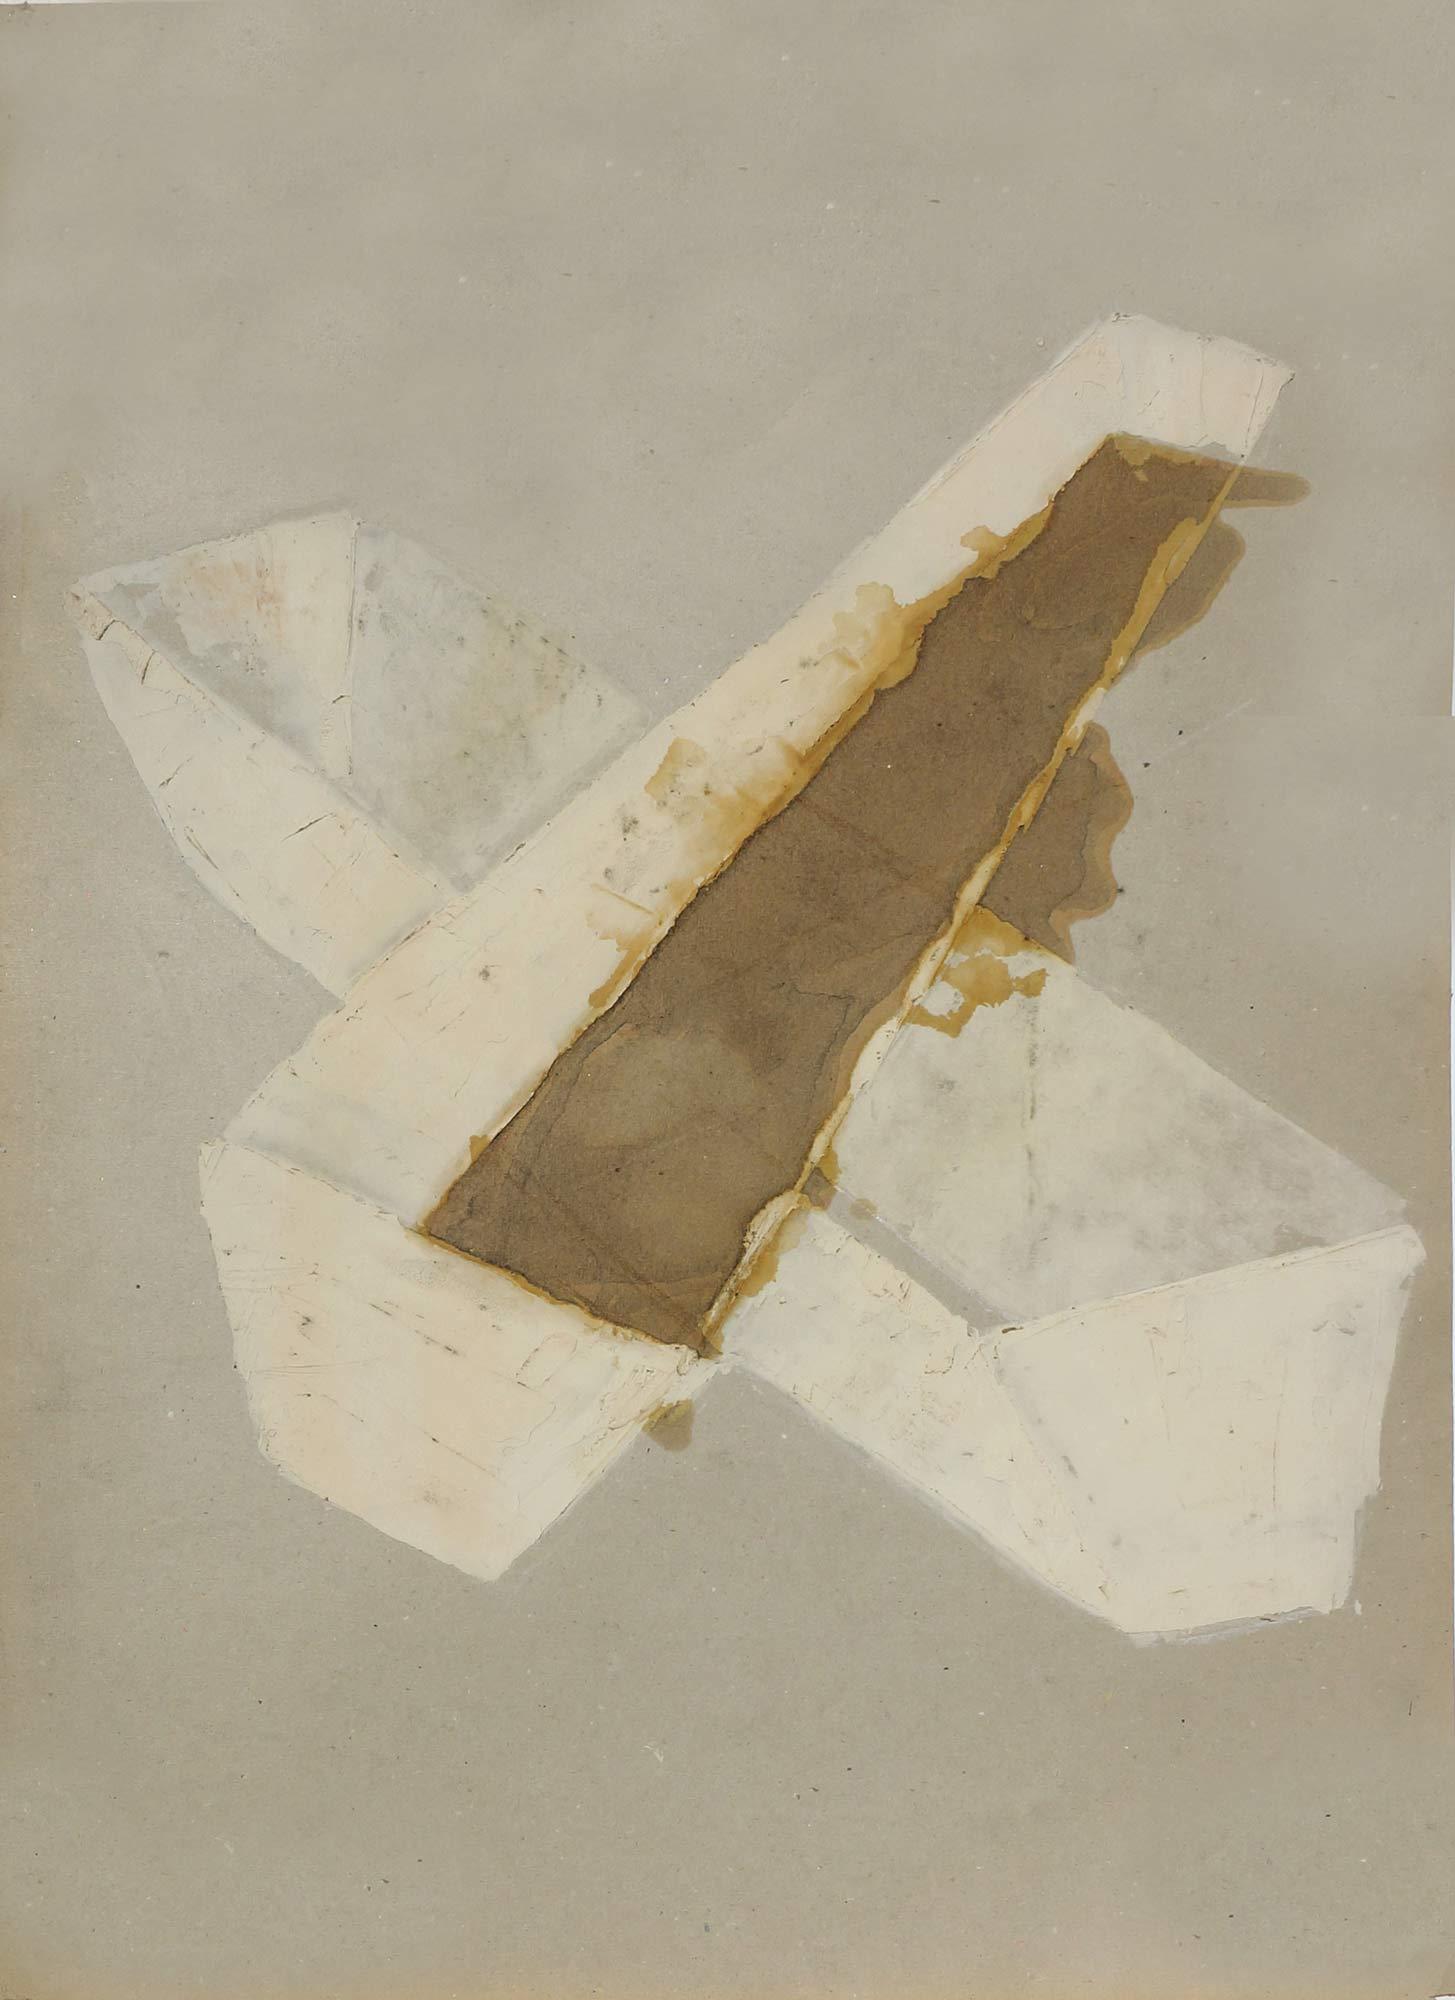 Bac  - 1988 – Encre, enduit, 80 x 60 x cm. Denis Falgoux